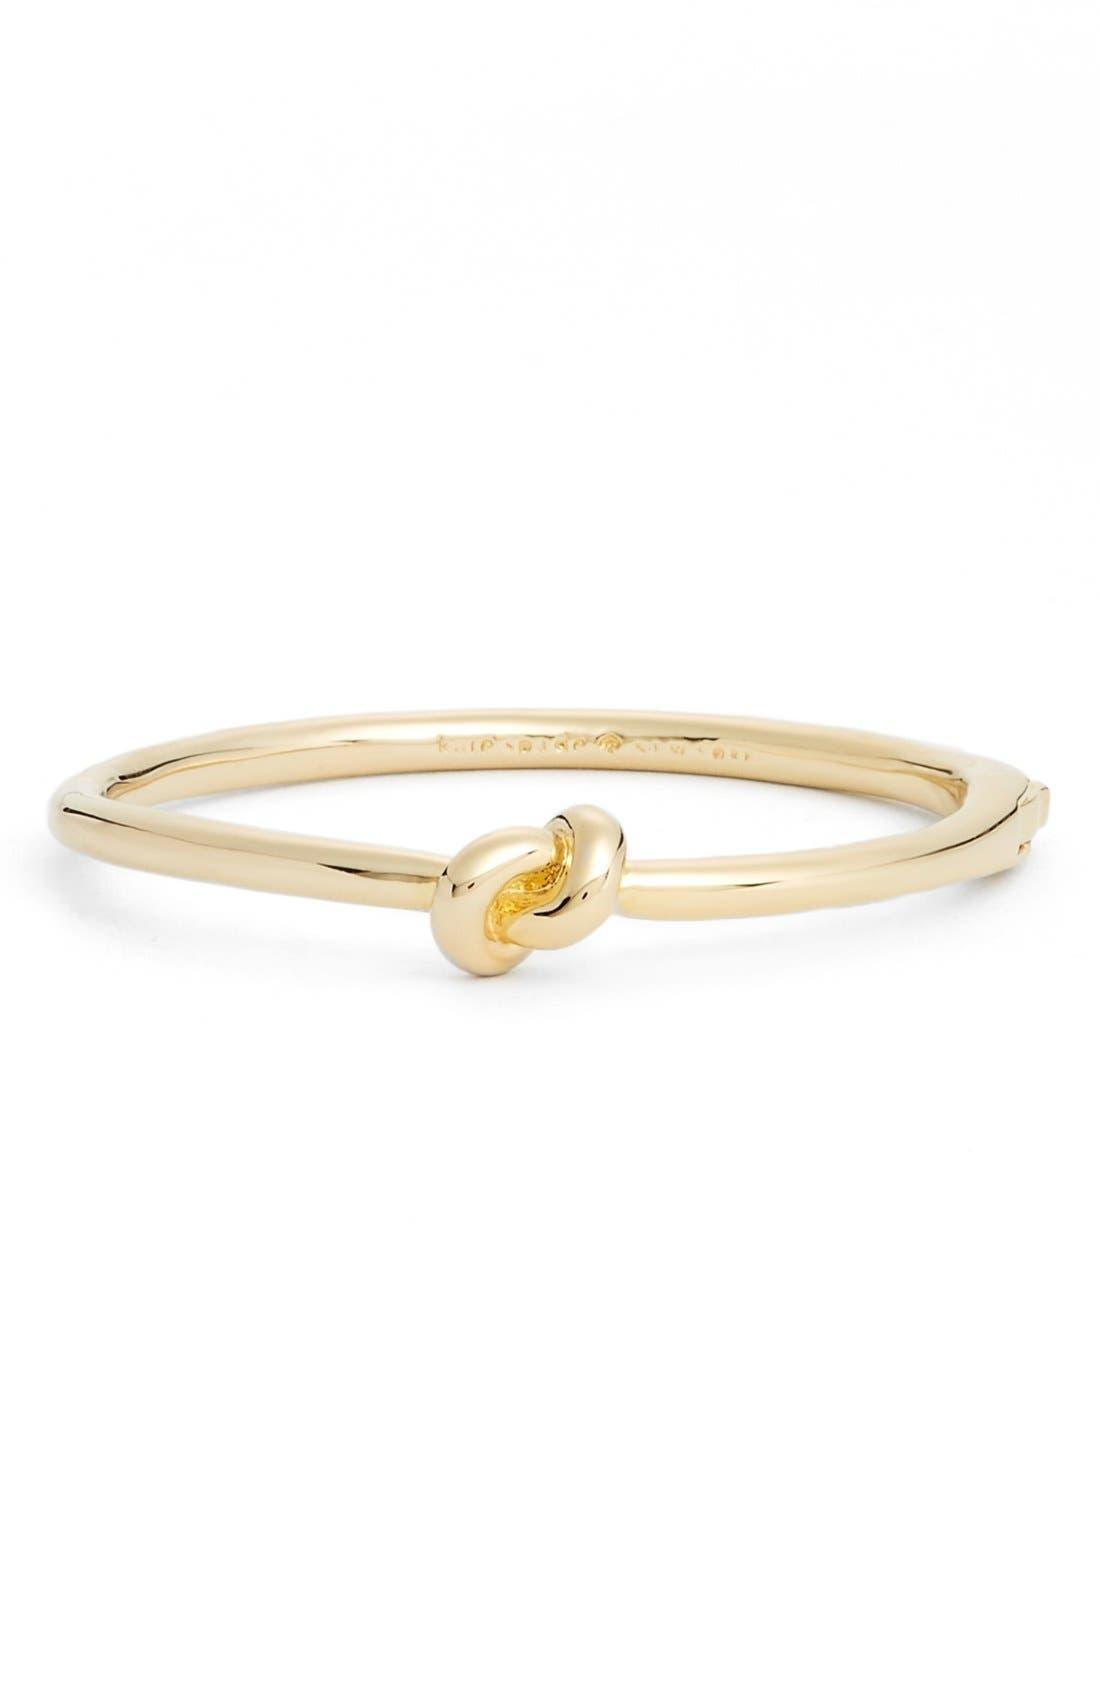 KATE SPADE NEW YORK 'sailors knot' bangle, Main, color, GOLD